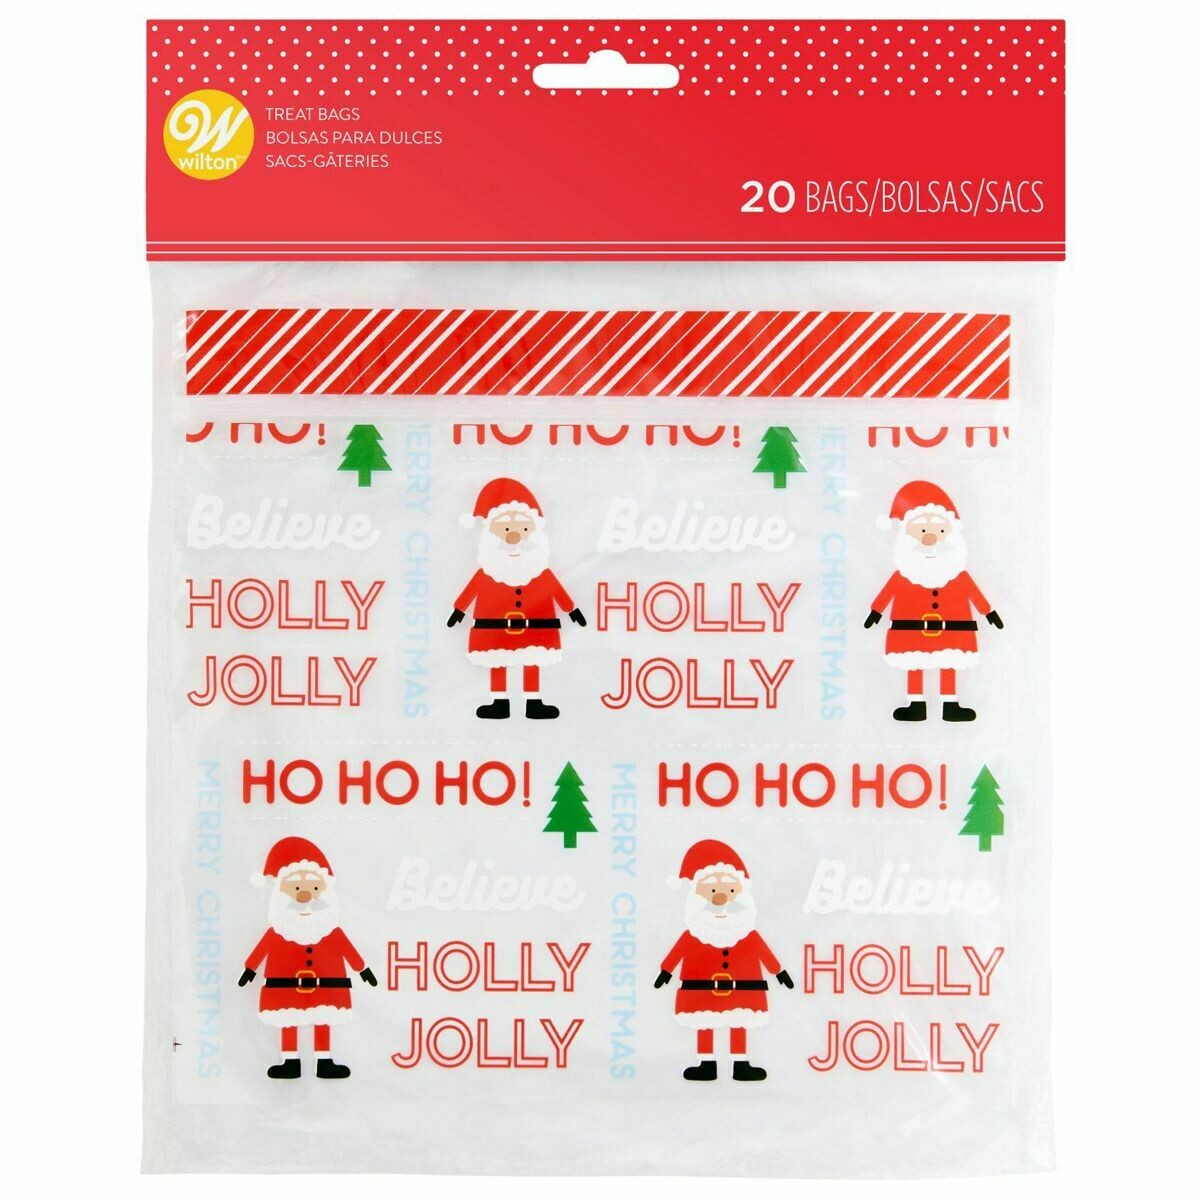 Wilton Christmas Treat Bags -HOLLY JOLLY Resealable Bags -Pack of 20 - 20τεμ  Επανασφραγιζόμενα Σακουλάκια για γλυκά Άγιος Βασίλης